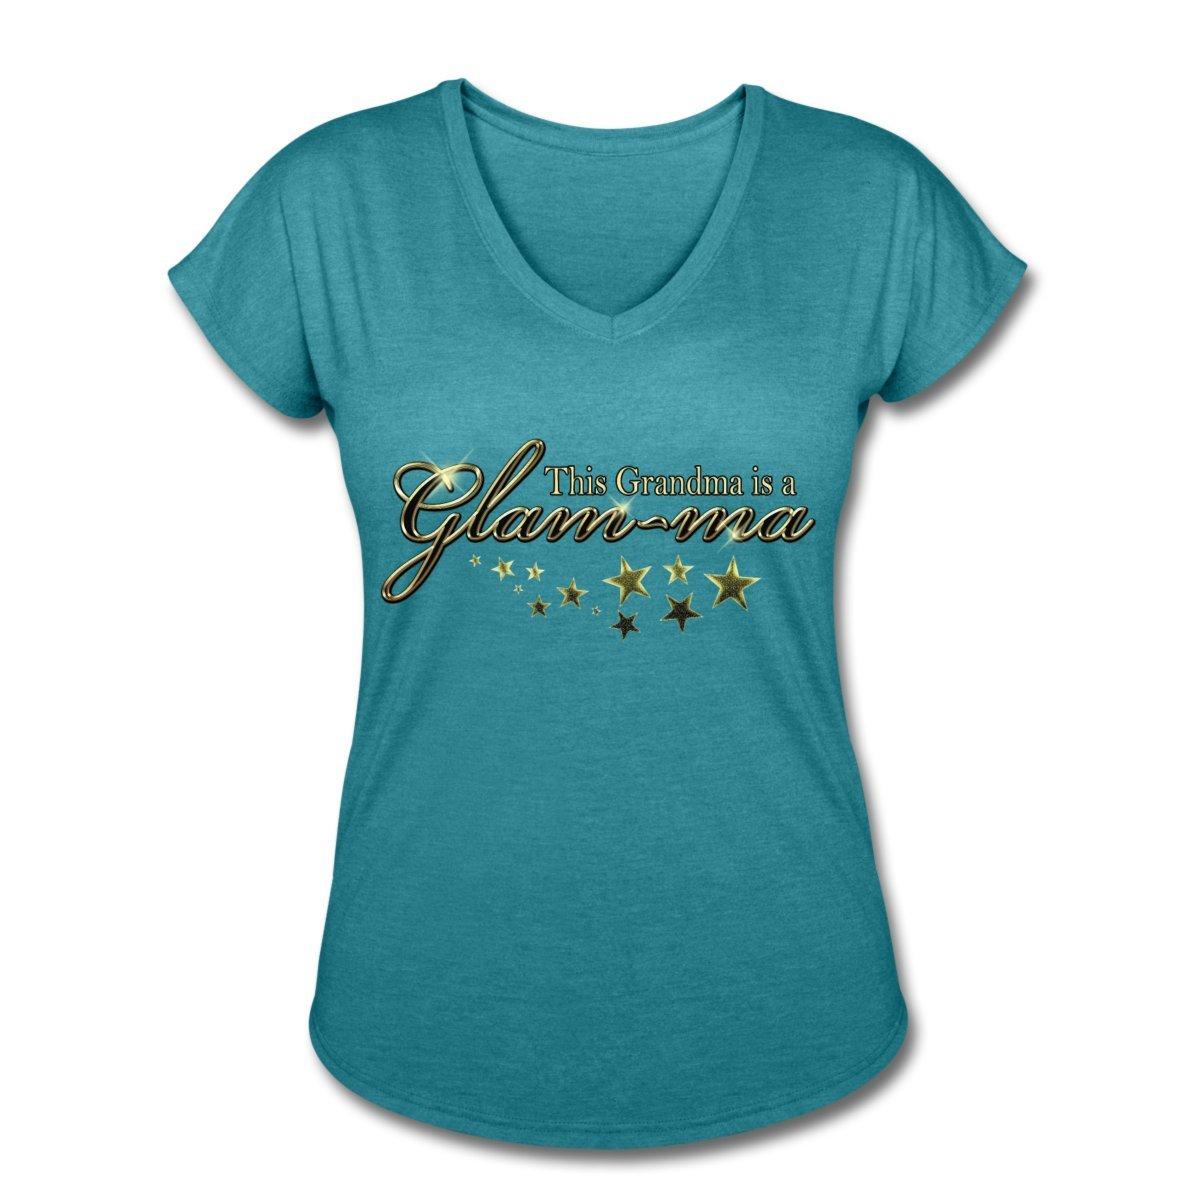 32ae0fb1c Amazon.com: Spreadshirt Grandma is A Glam-ma Women's Tri-Blend V-Neck  T-Shirt: Clothing